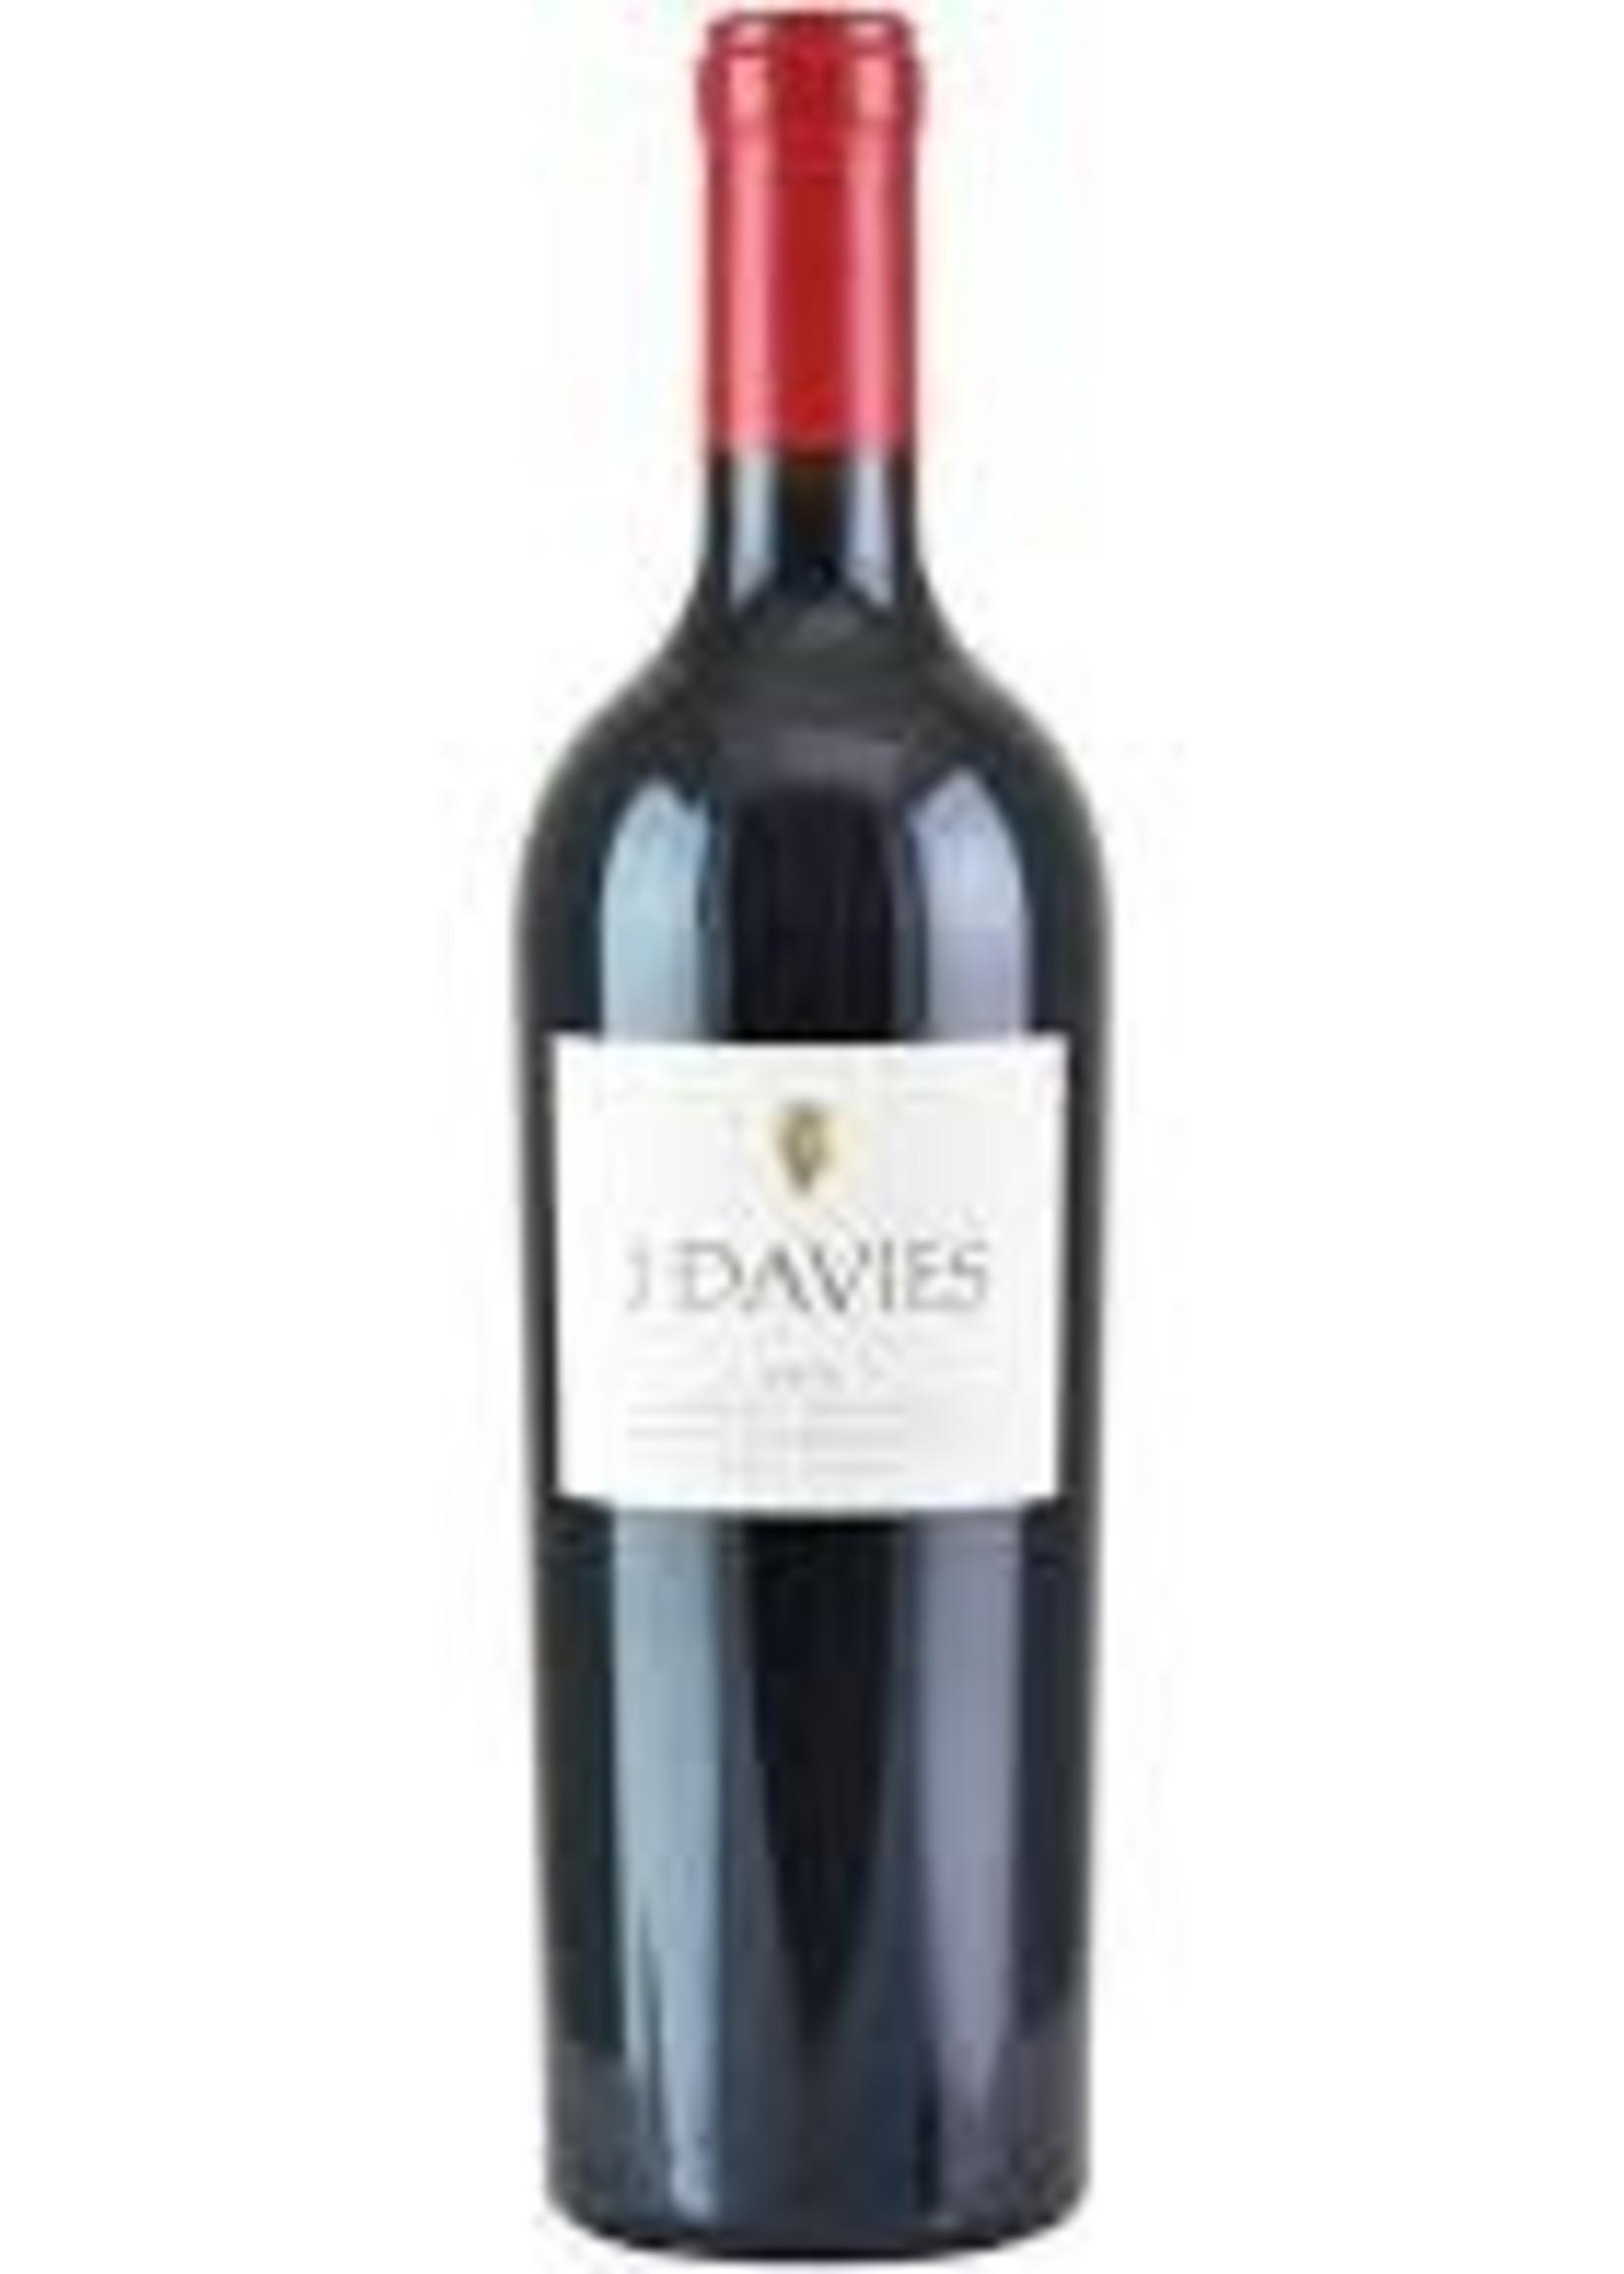 J. Davies 2015 Cabernet Sauvignon Diamond Mtn District 750ml